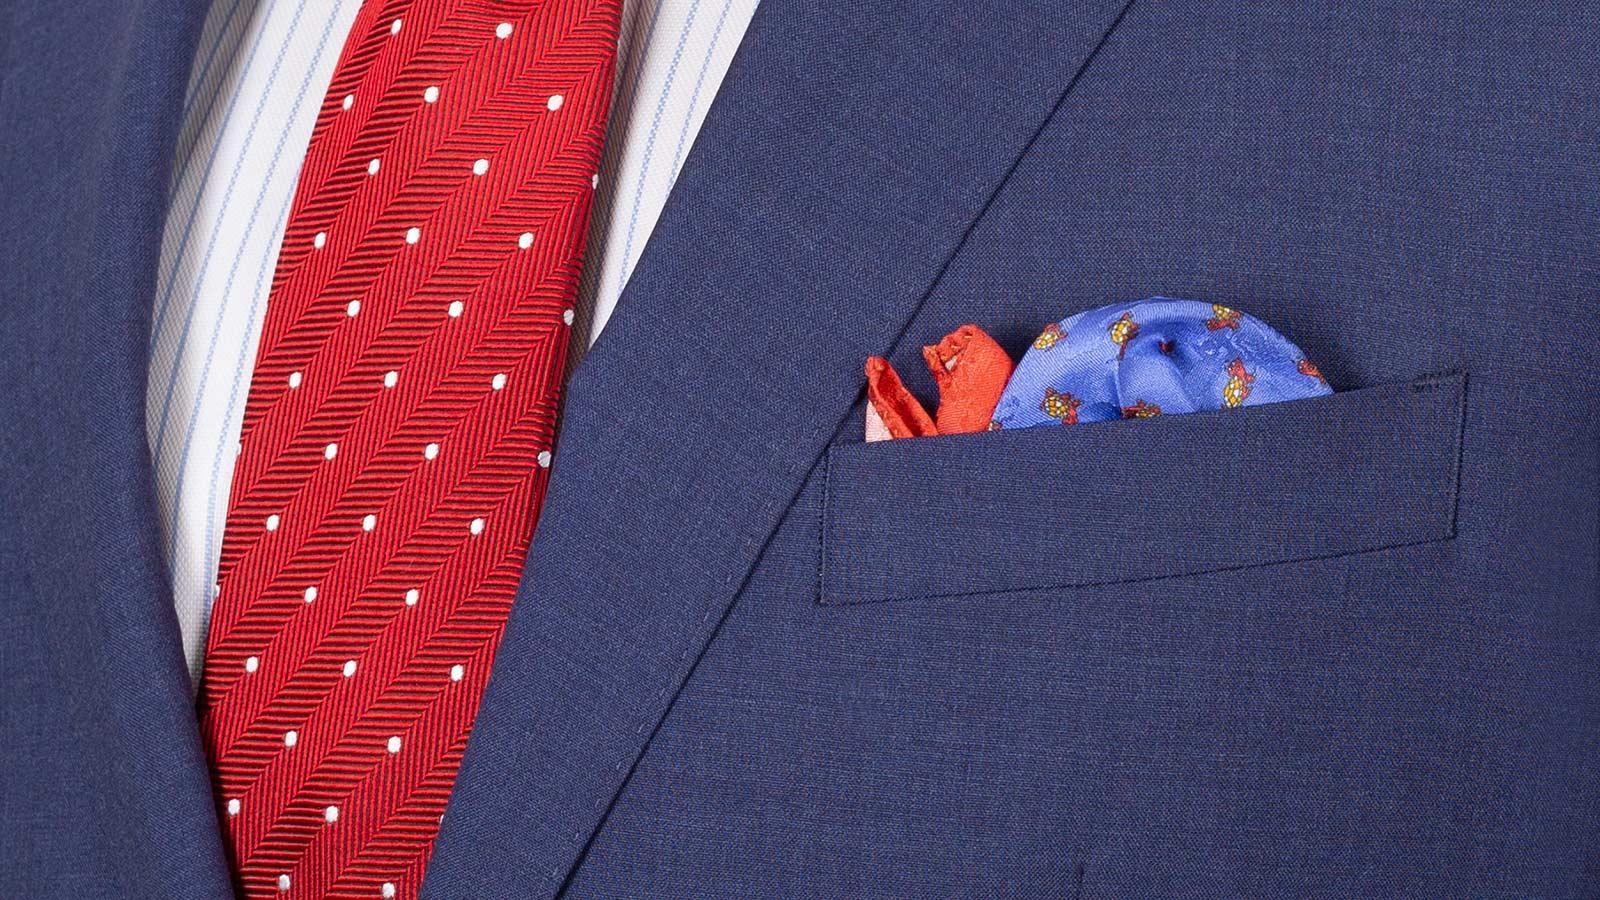 Tropical Rustic Blue Suit - slider image 1